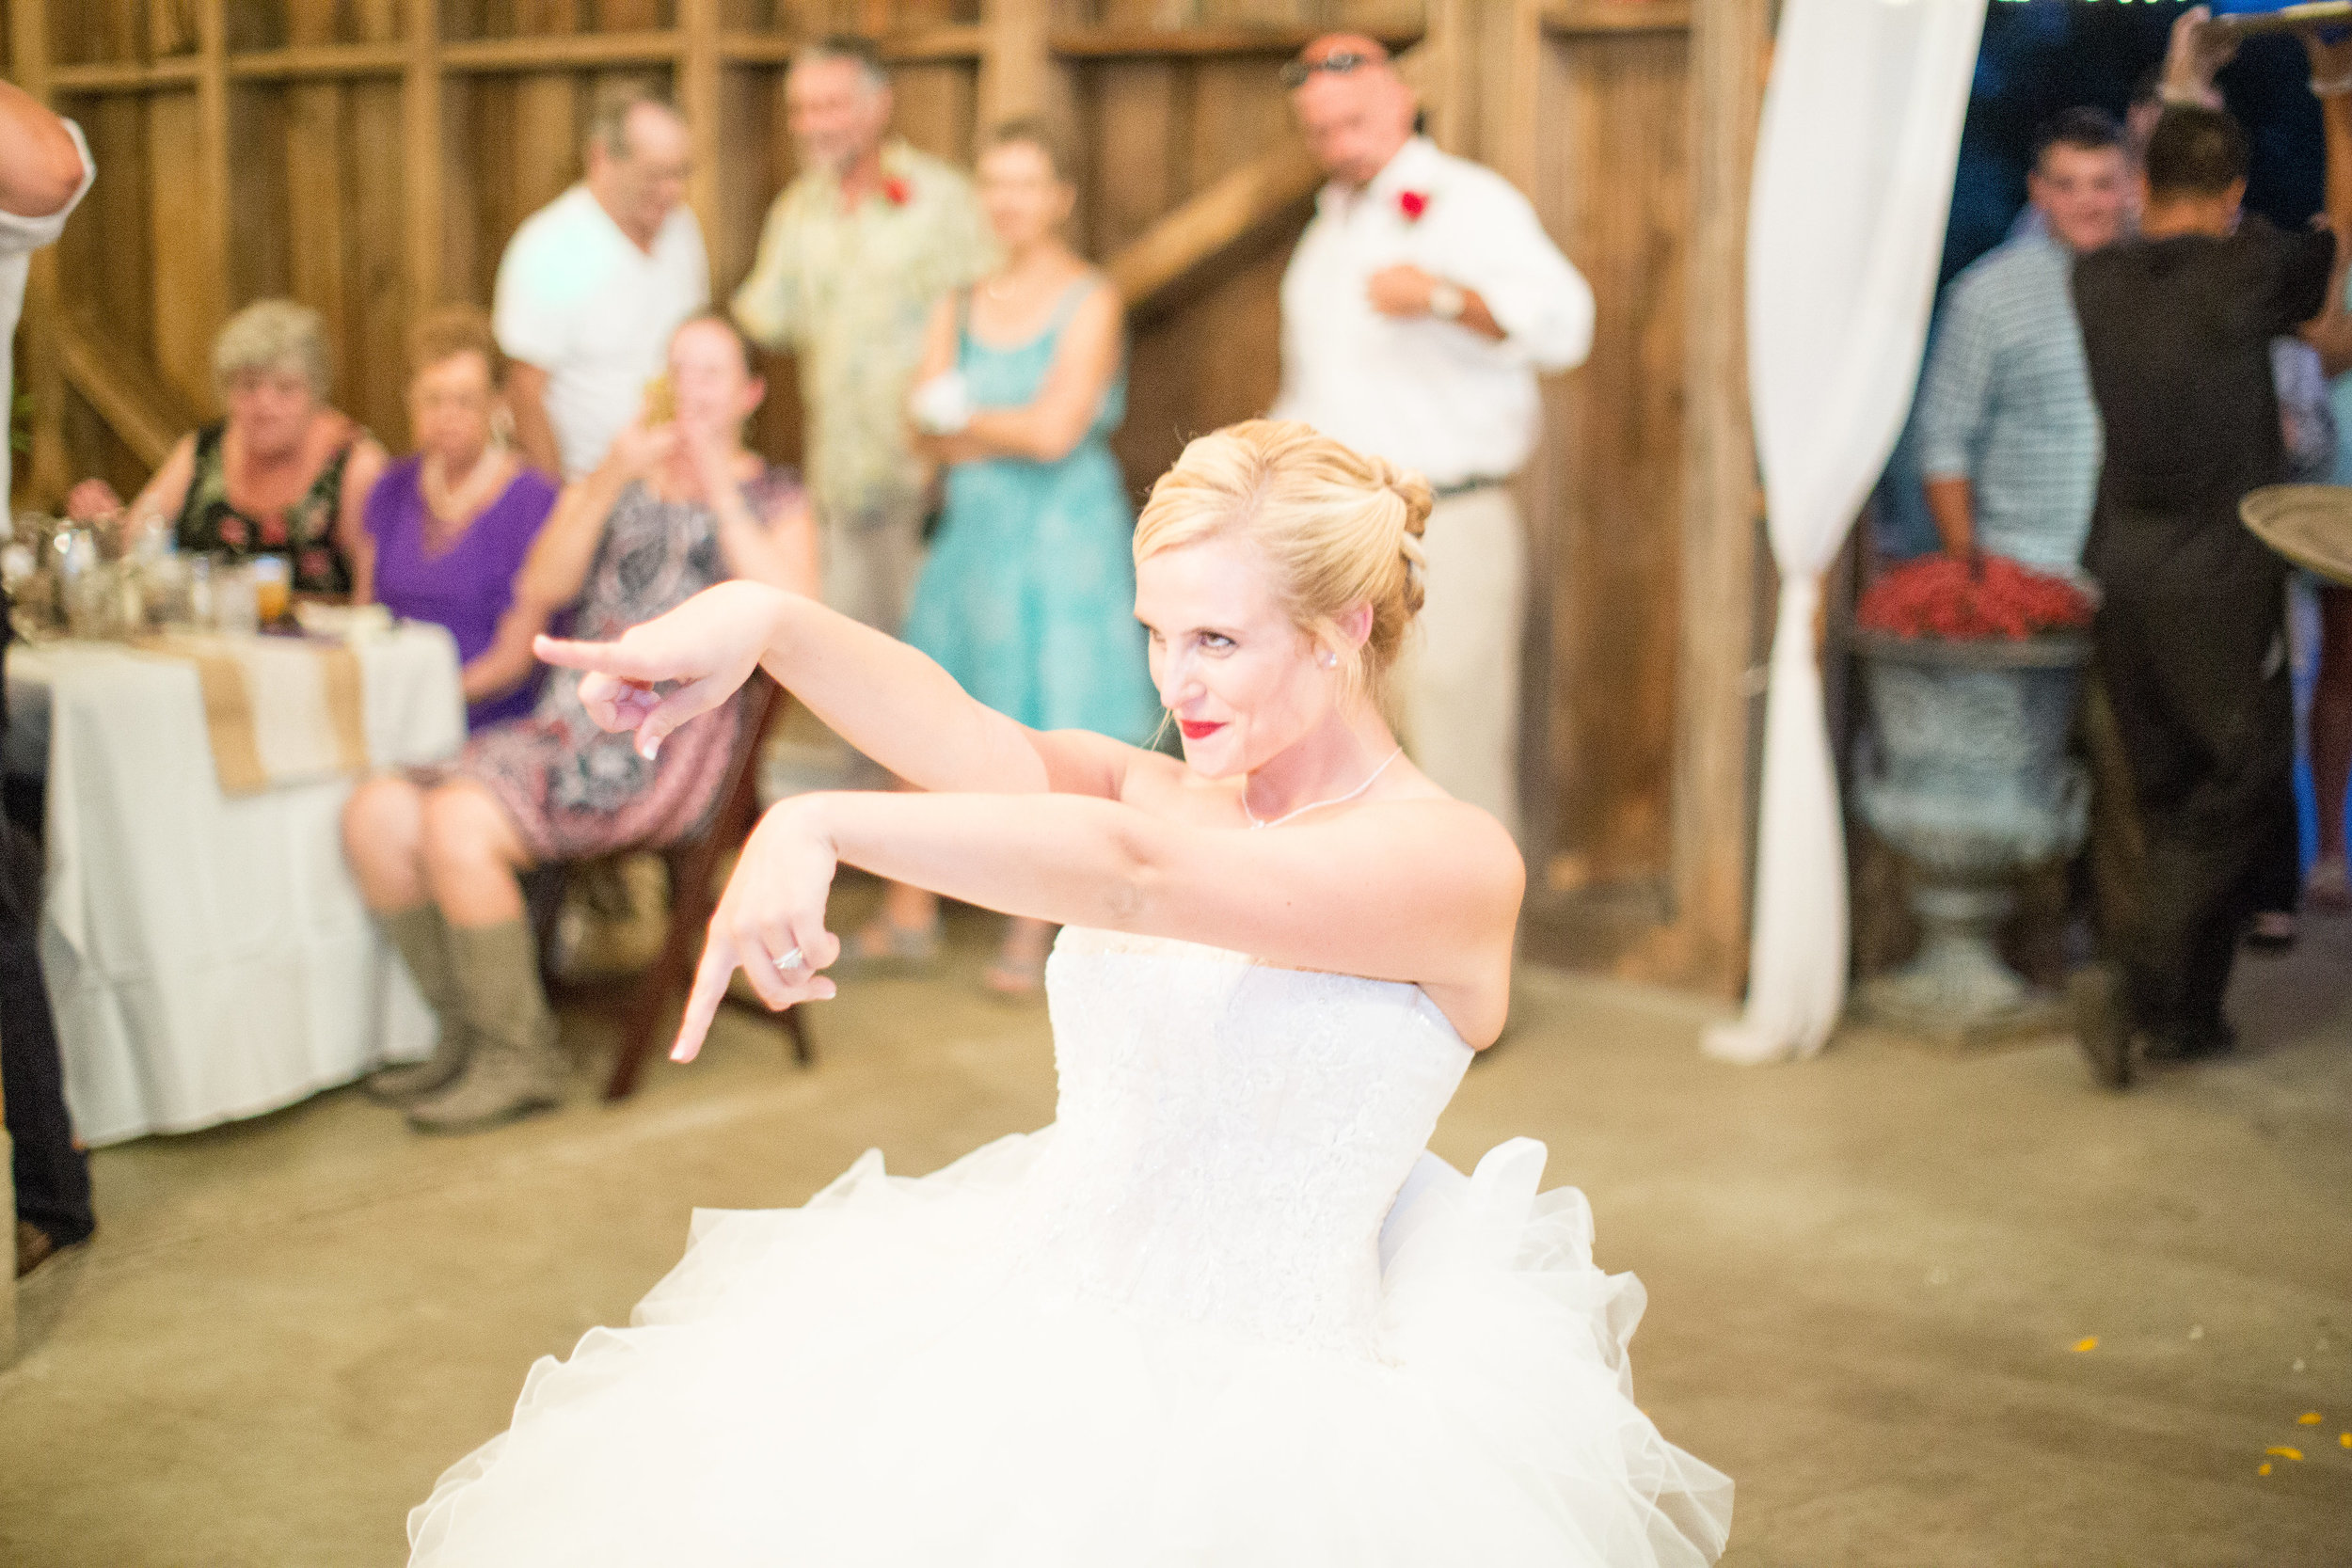 bride-garter-toss-country-rustic-wedding-photos.jpg